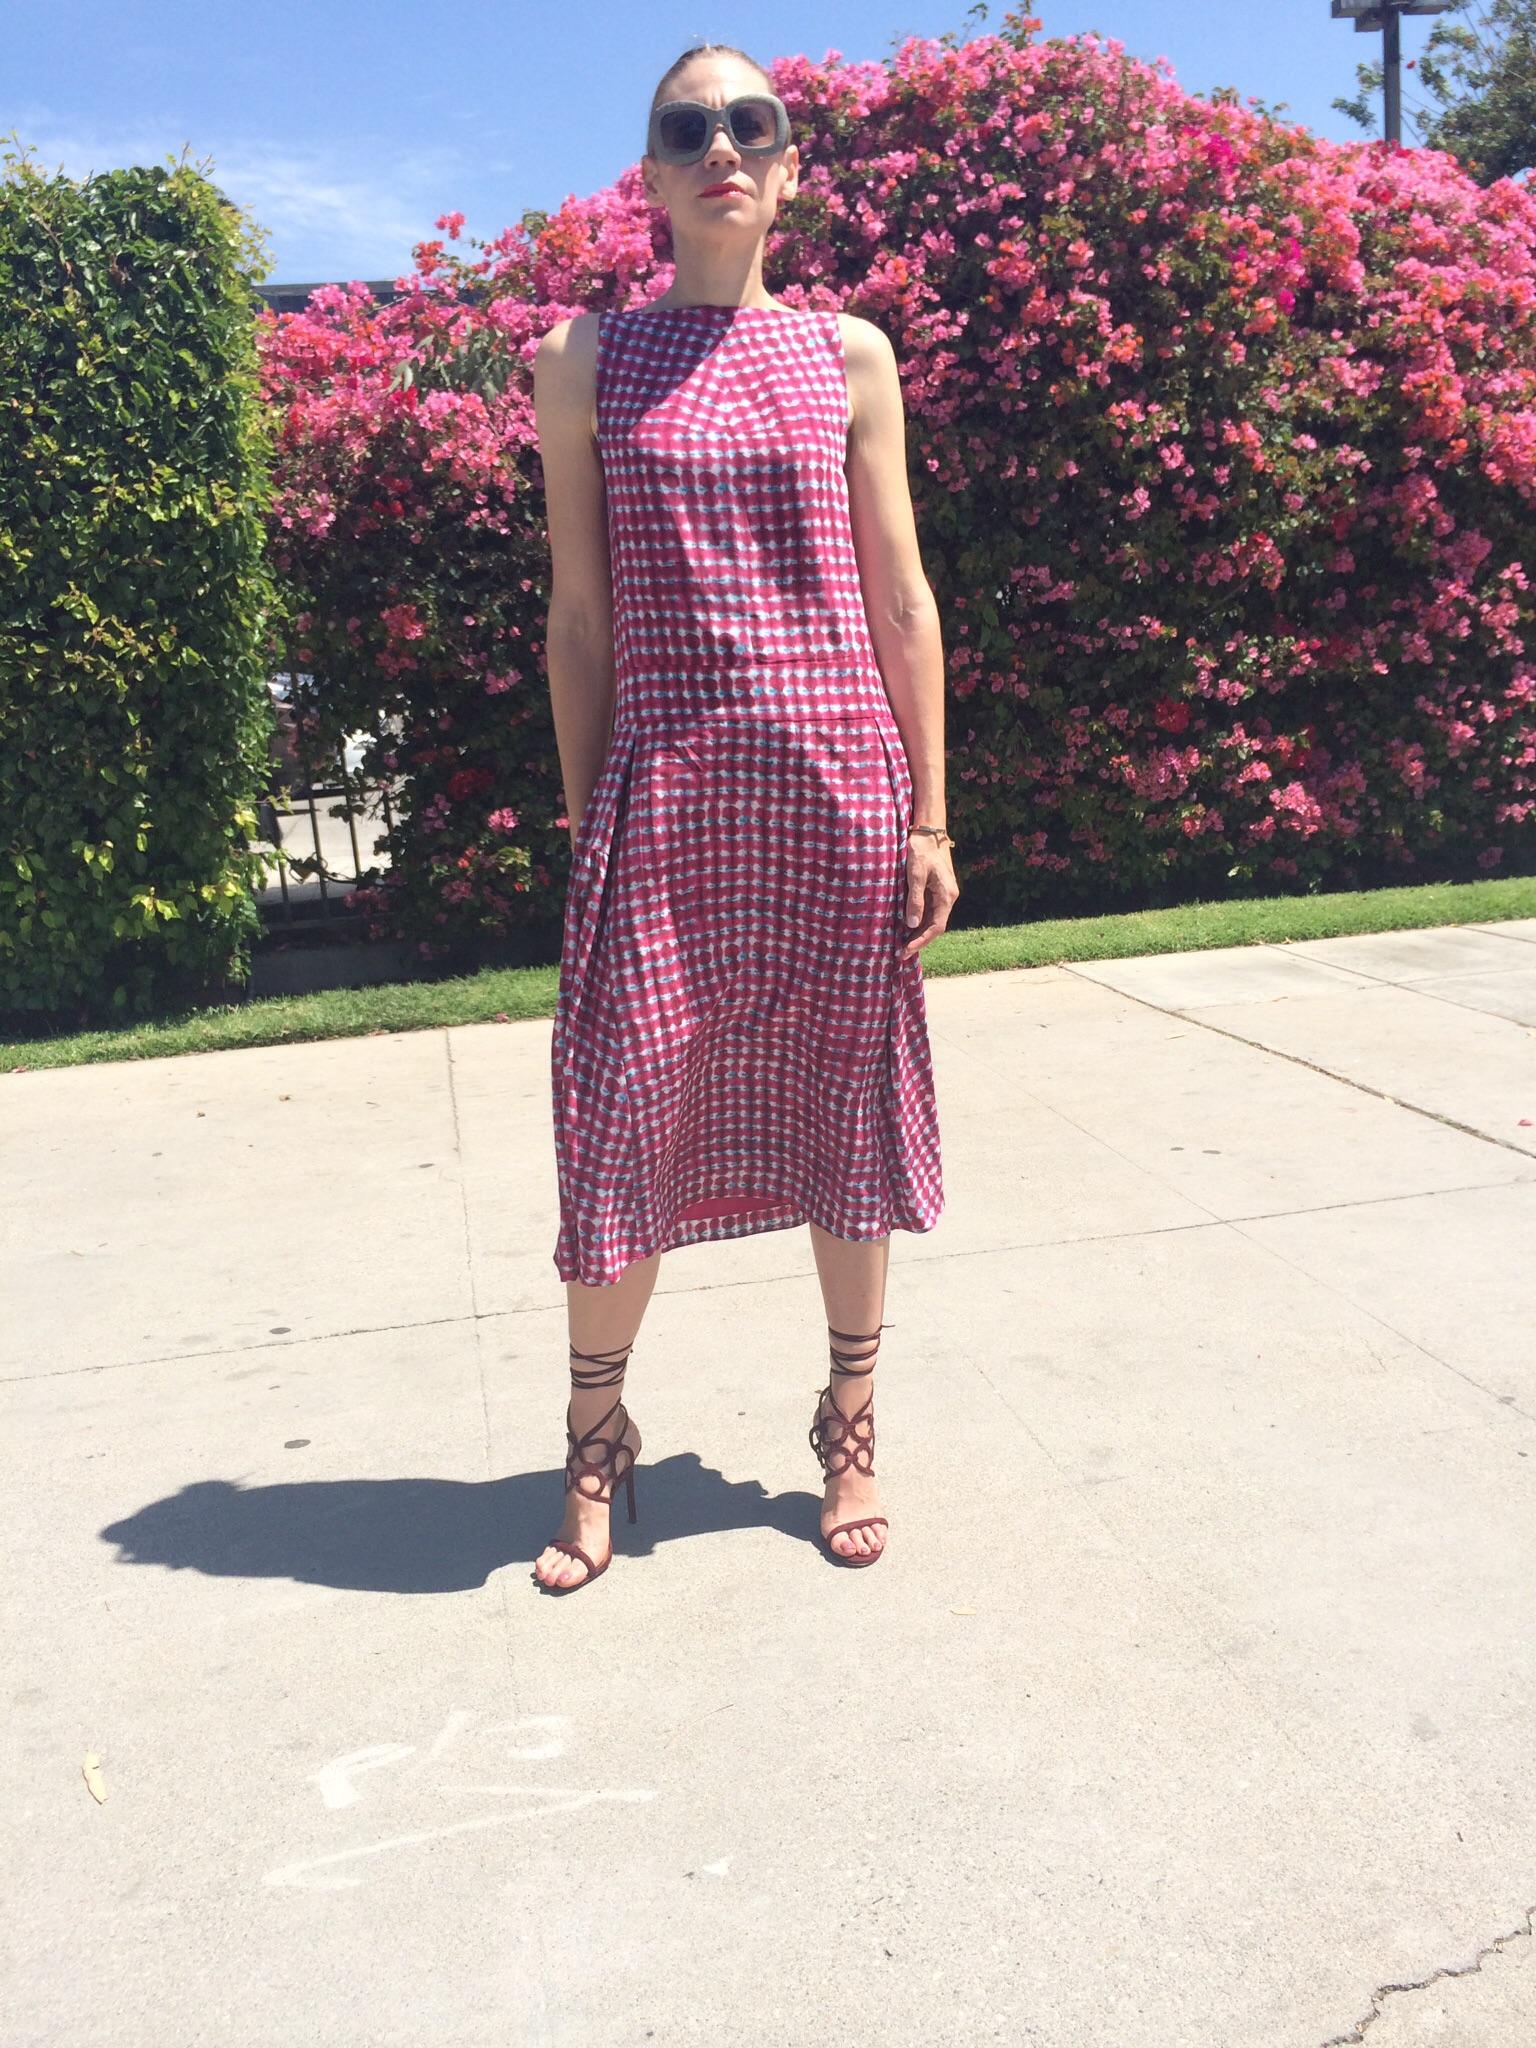 Investment Piece: April Dresses Bring